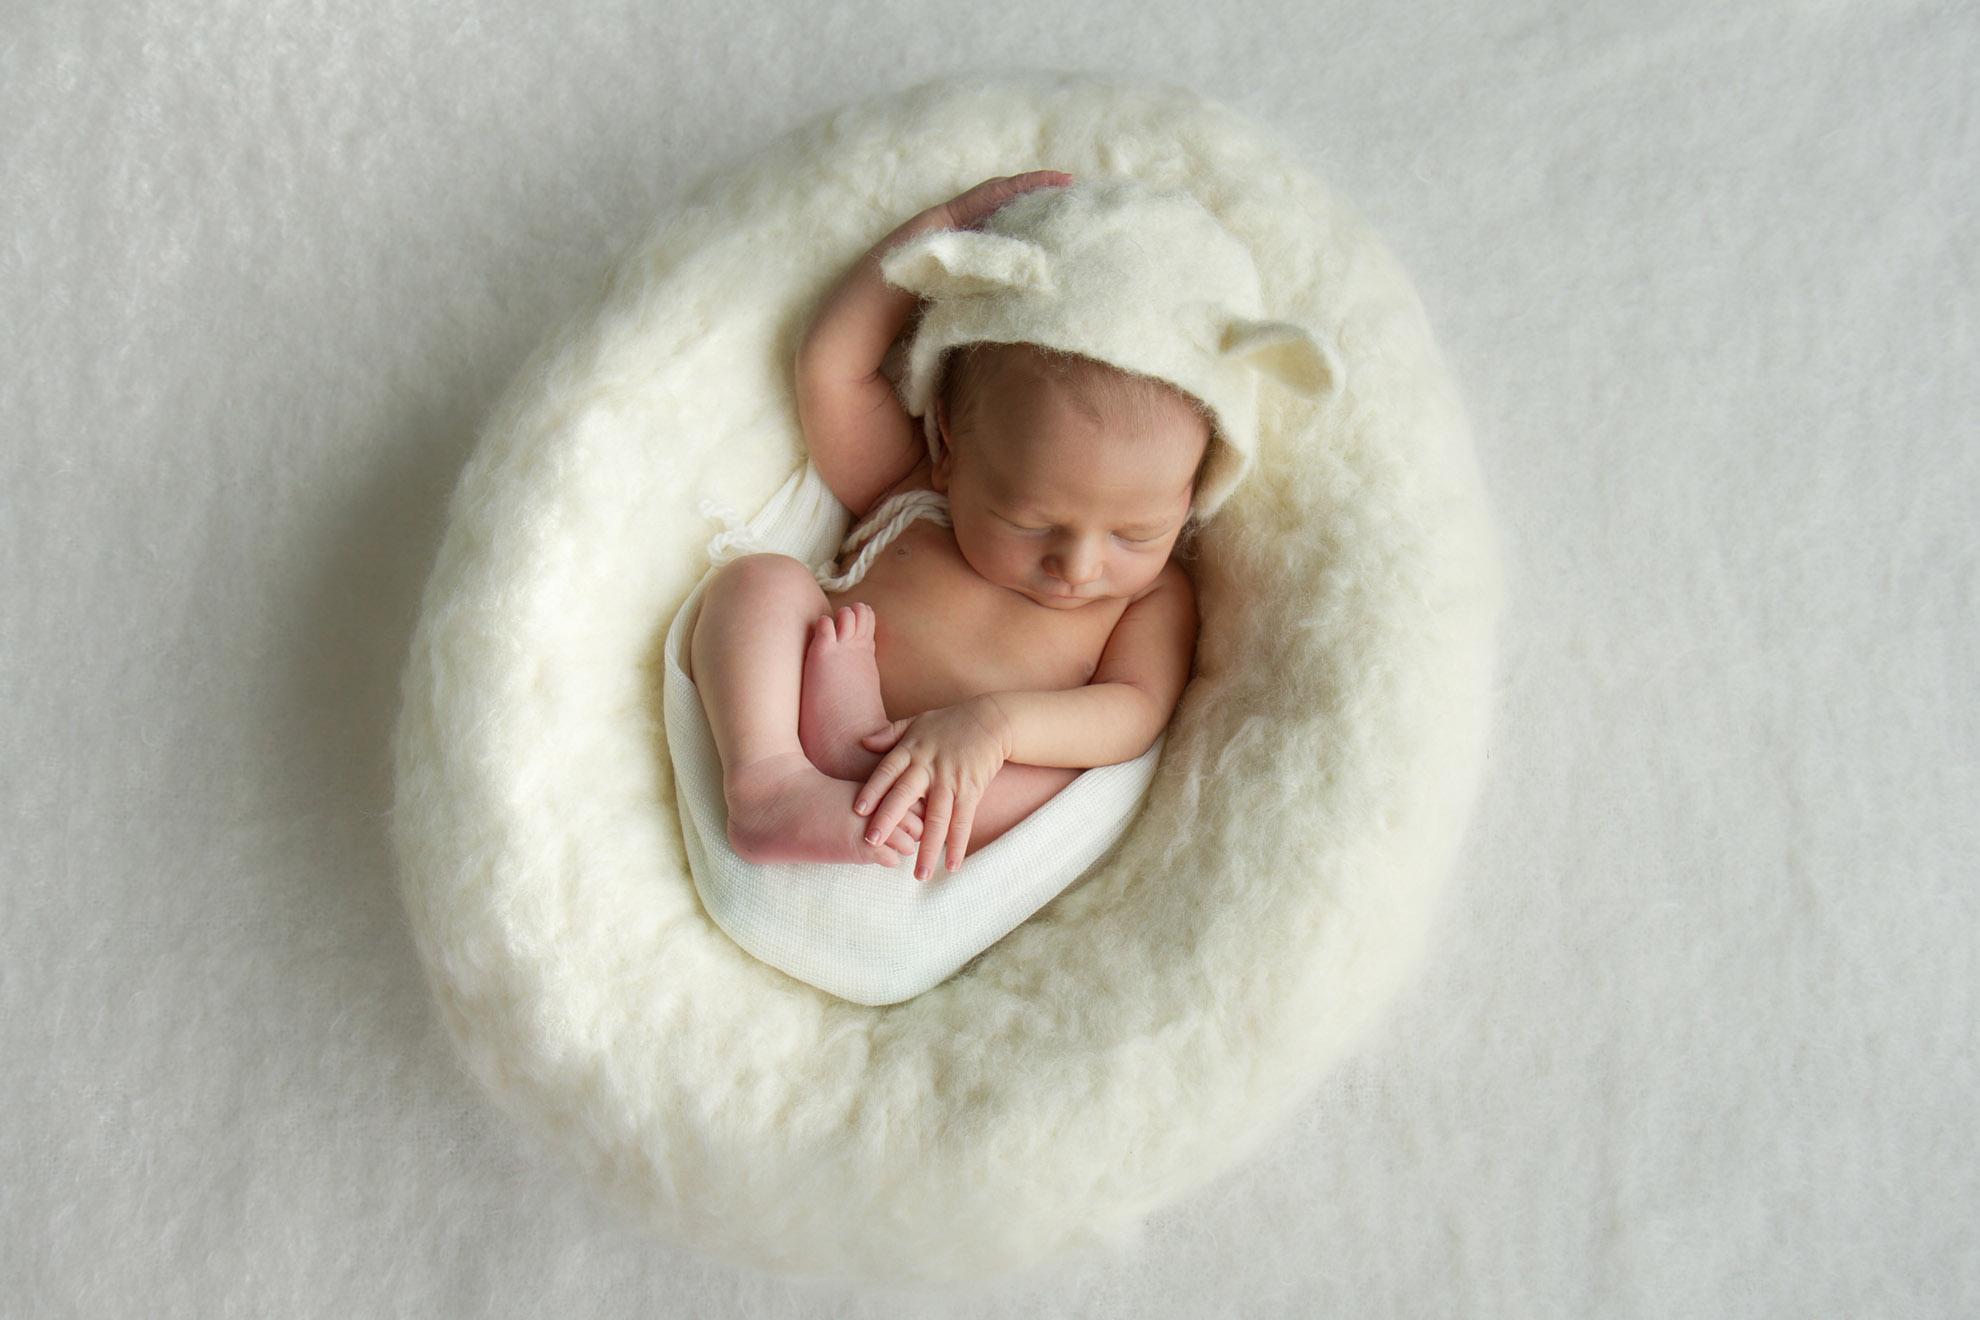 Hamilton-photographer-newborn-in-wool-nest-with-lamb-hat.jpg